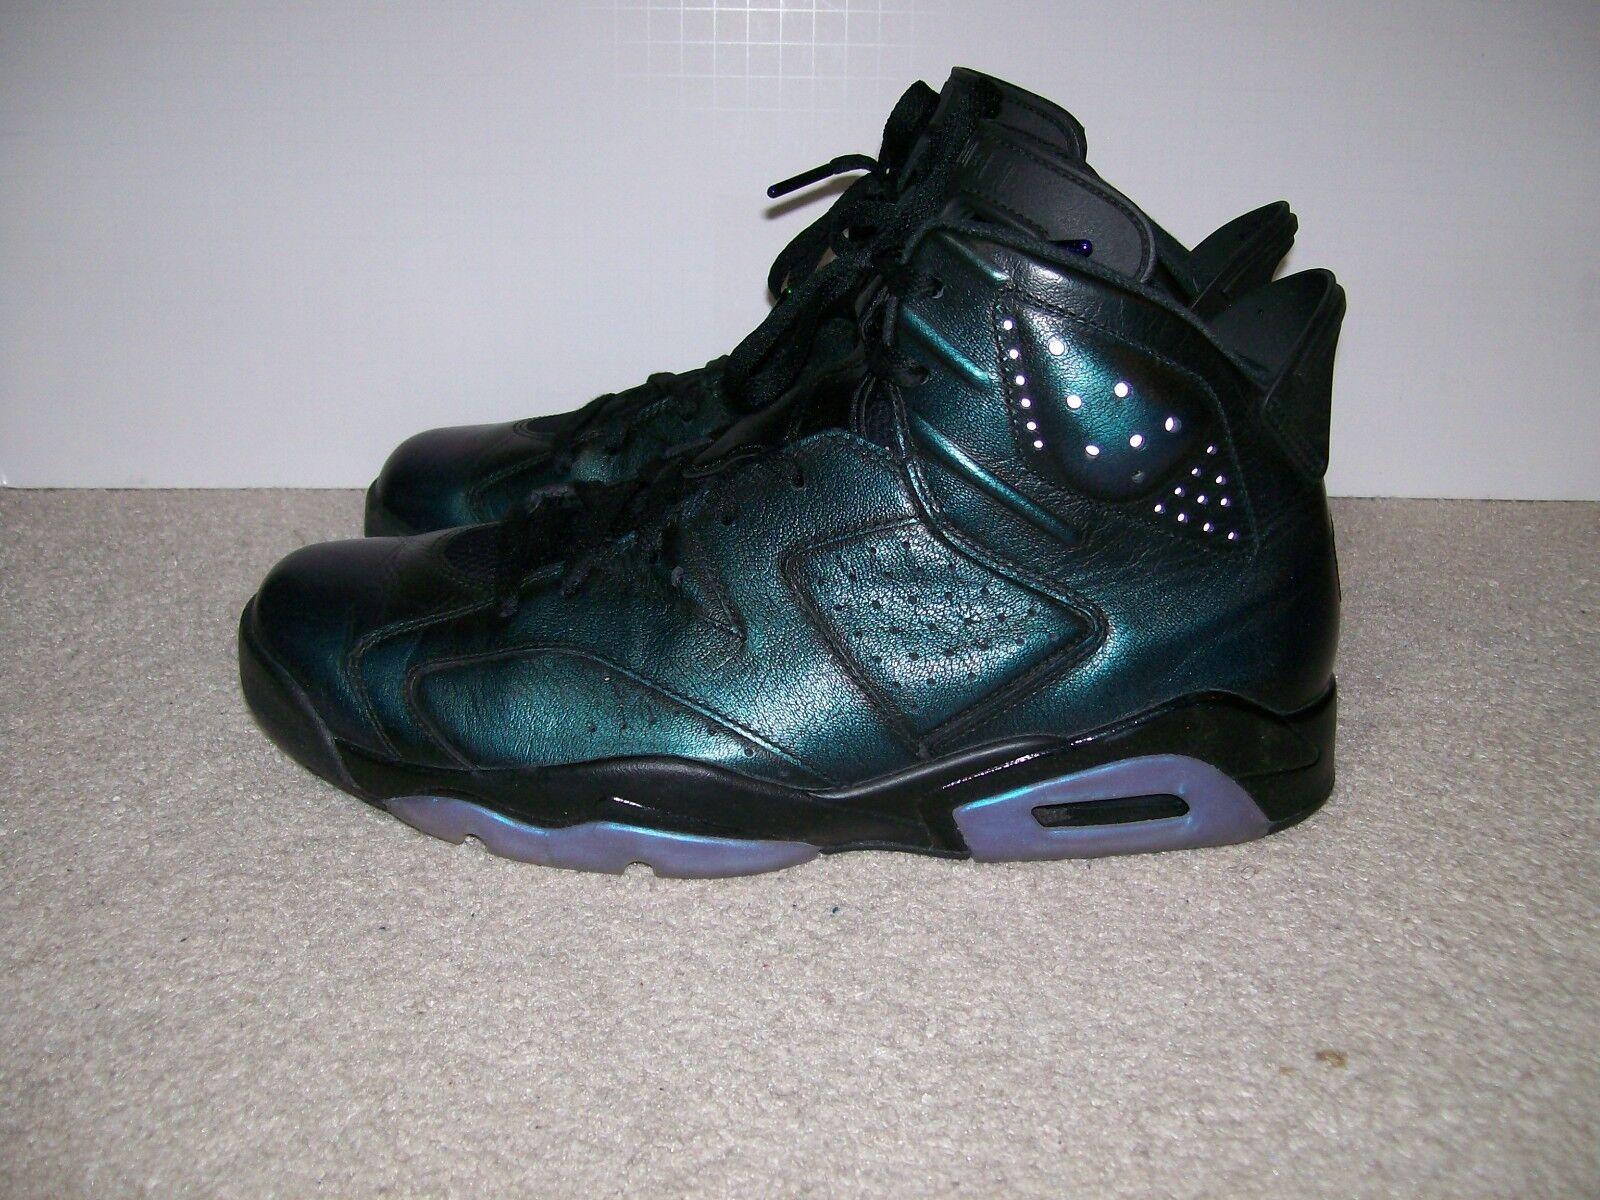 SZ 12 Nike Air Jordan 6 VI All Star infrared Bred 907961 015 XI XII IV Gatorade